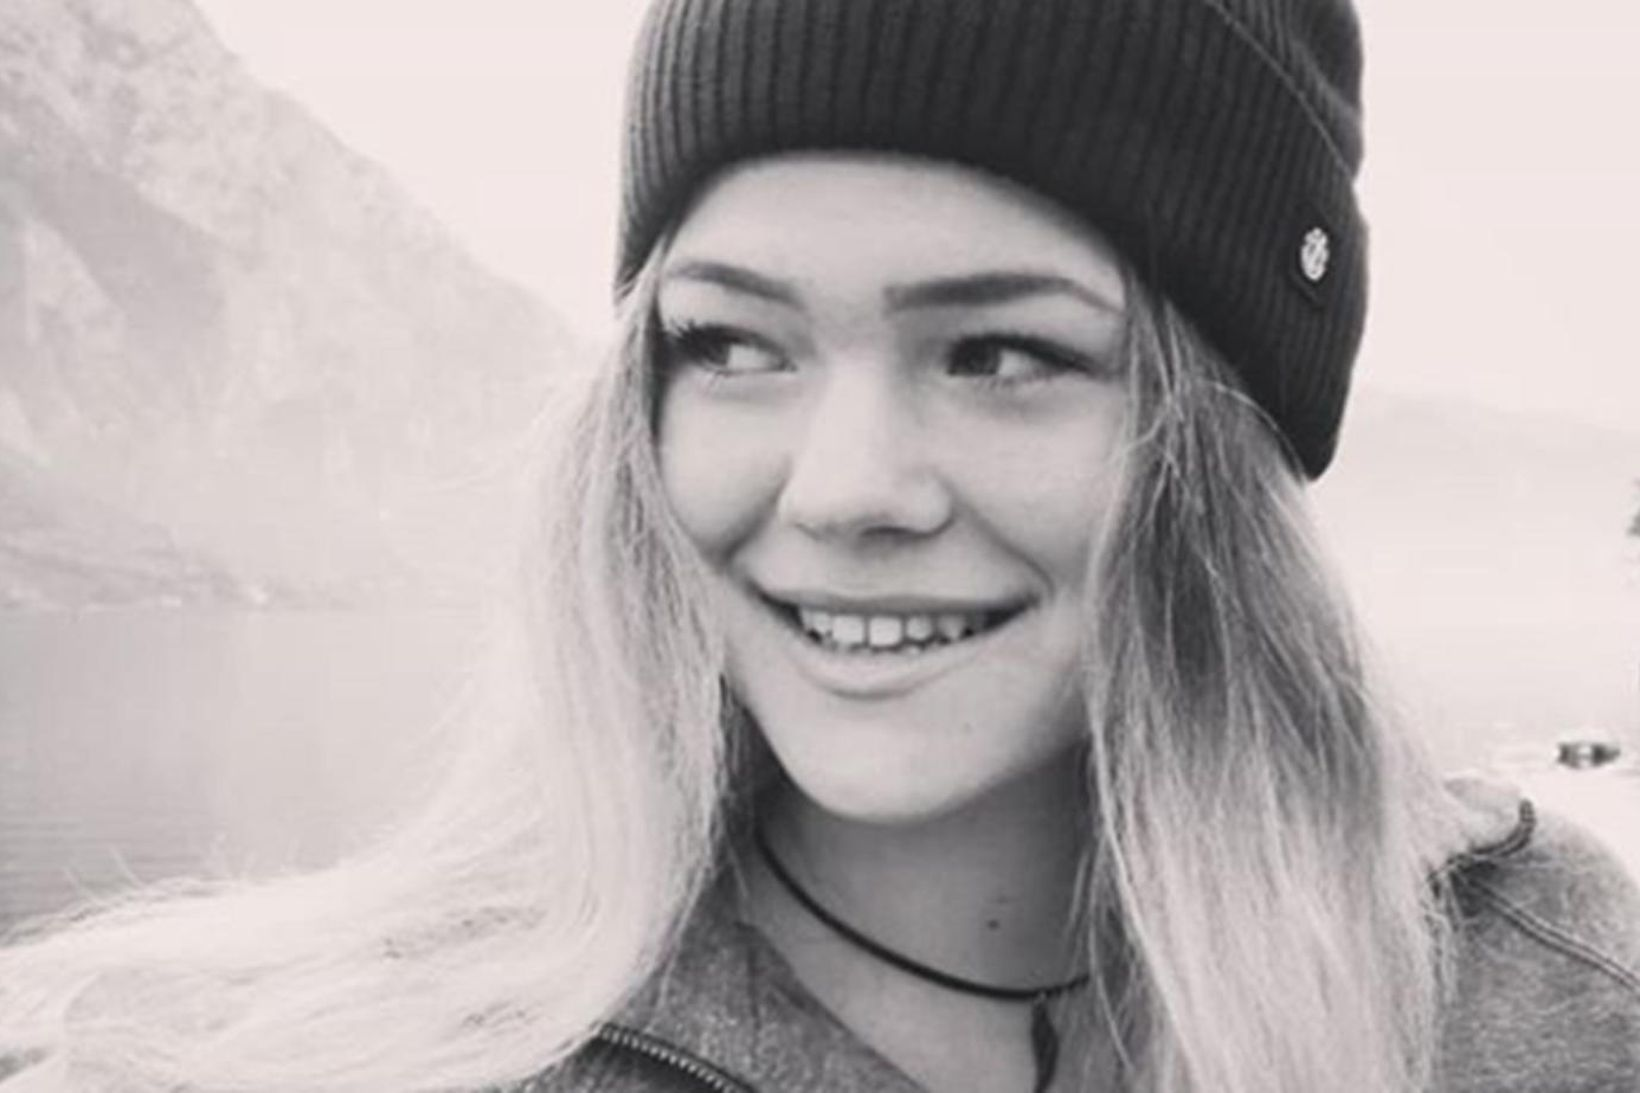 Johanna Bassani var aðeins 18 ára þegar hún lést.